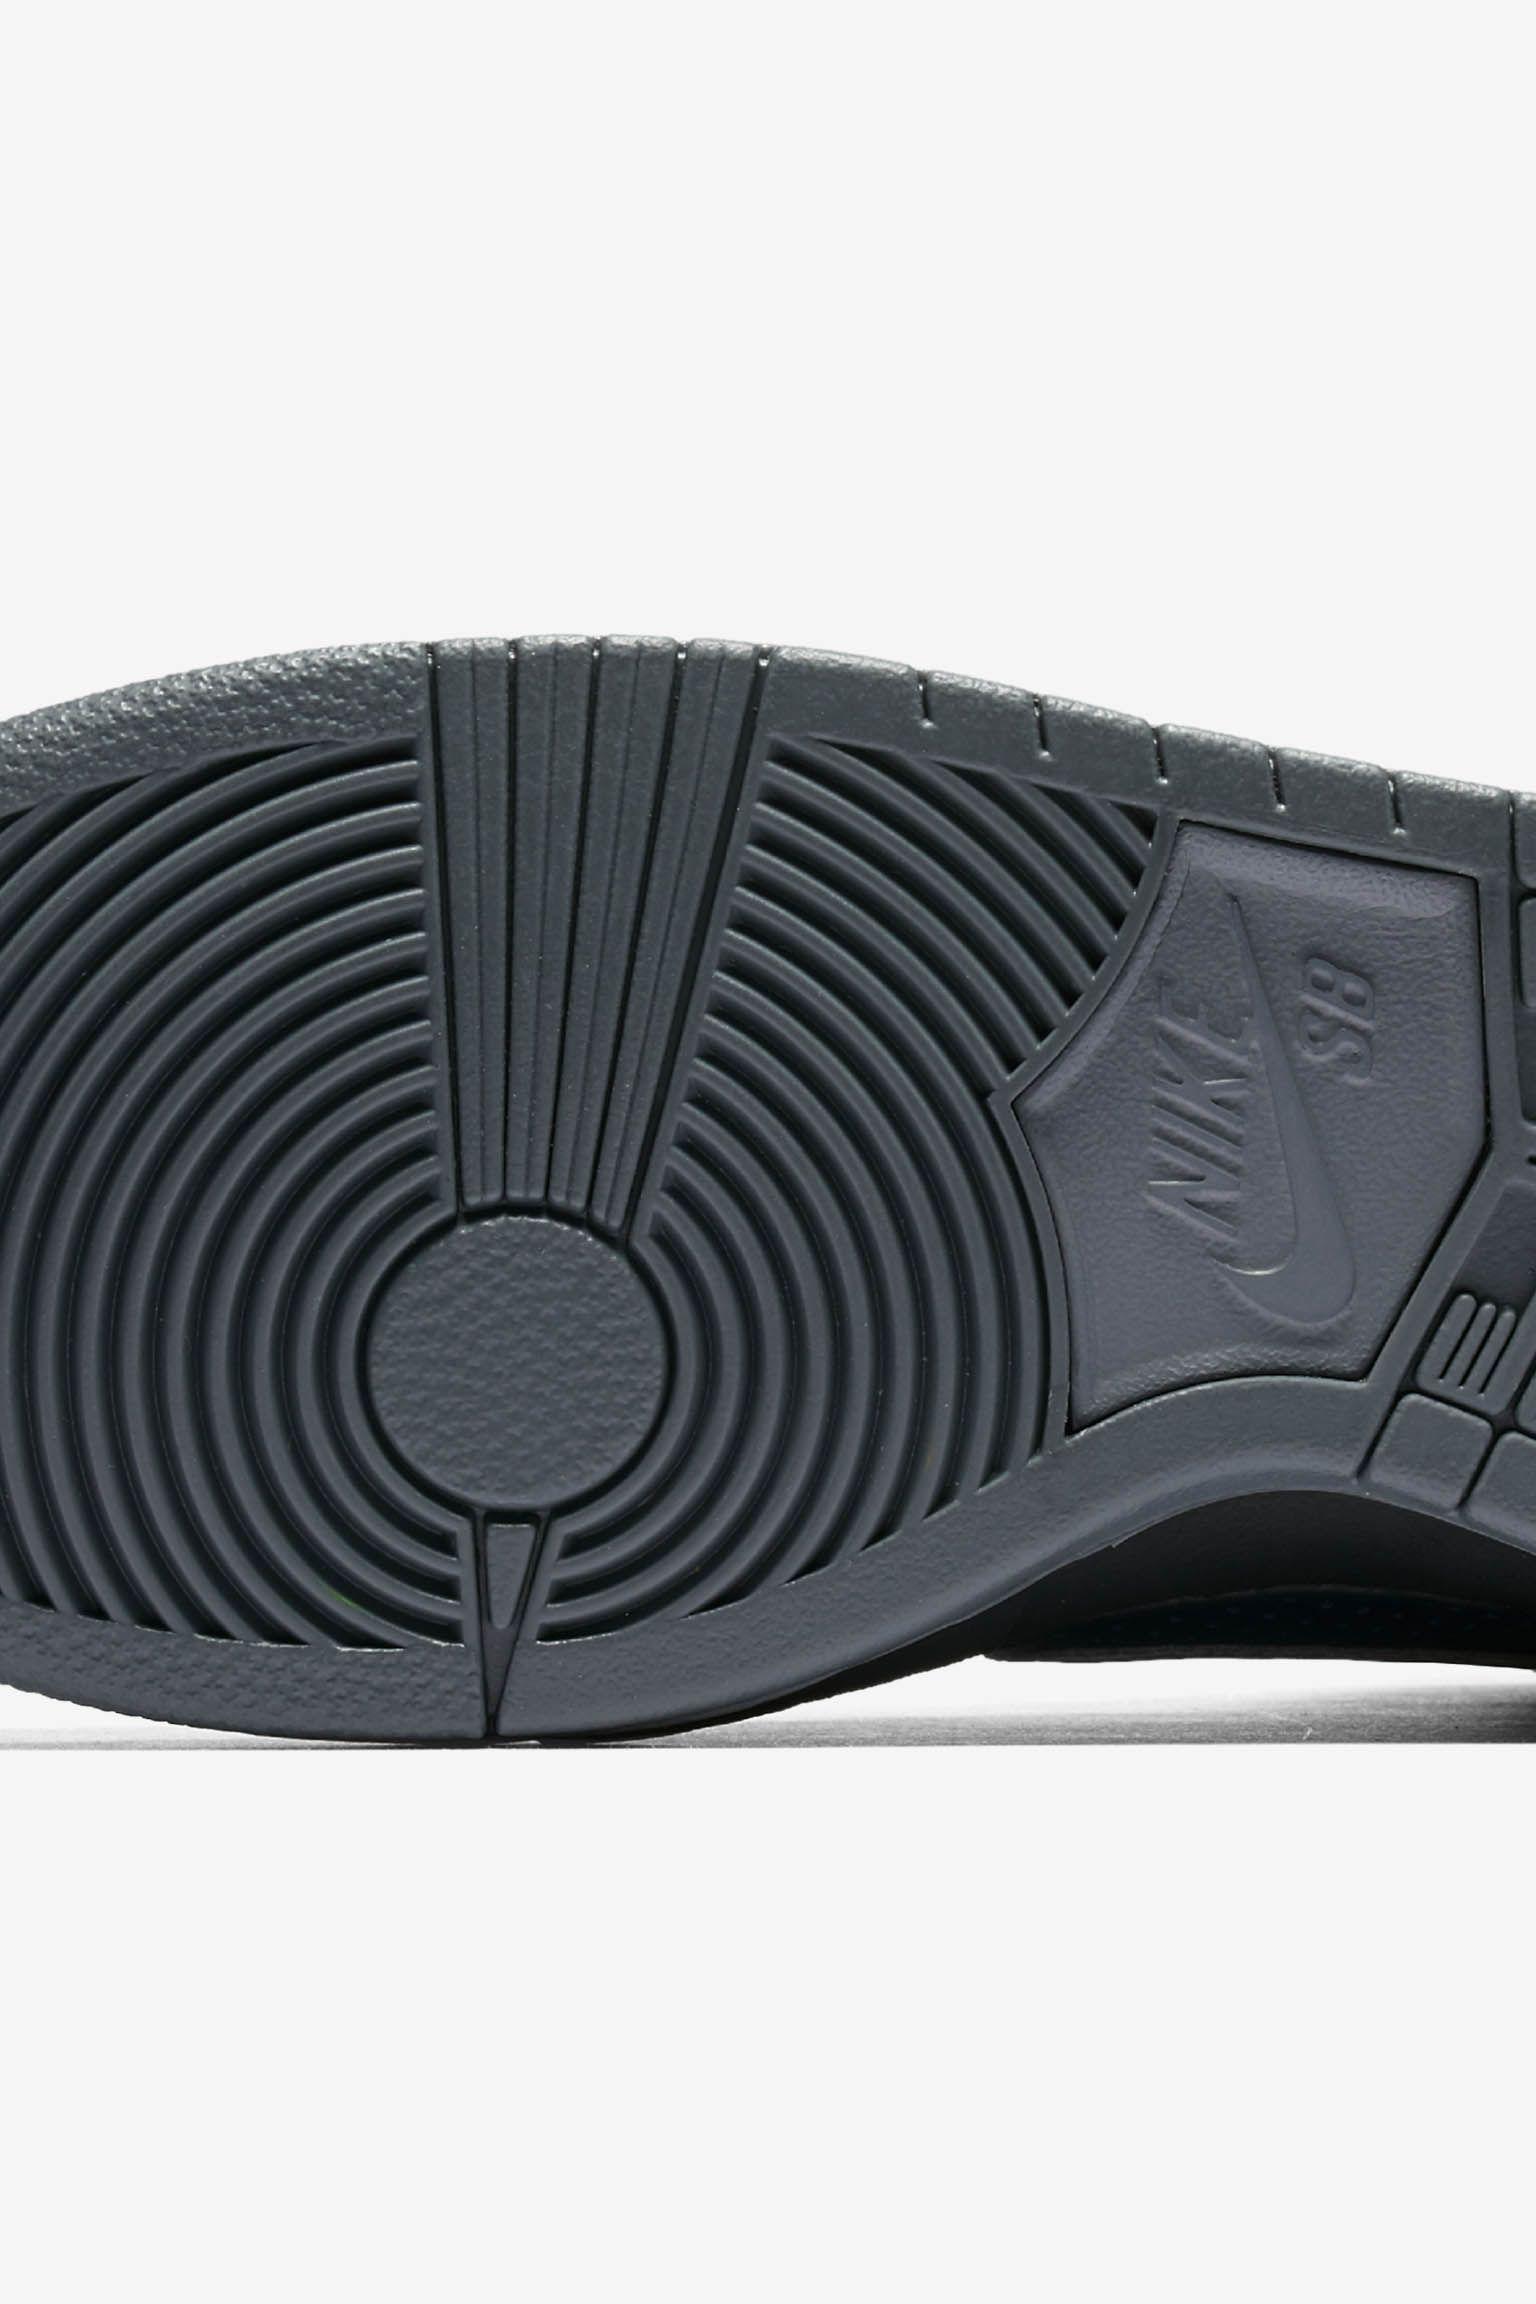 Nike SB Dunk Hi Pro 'Gino'